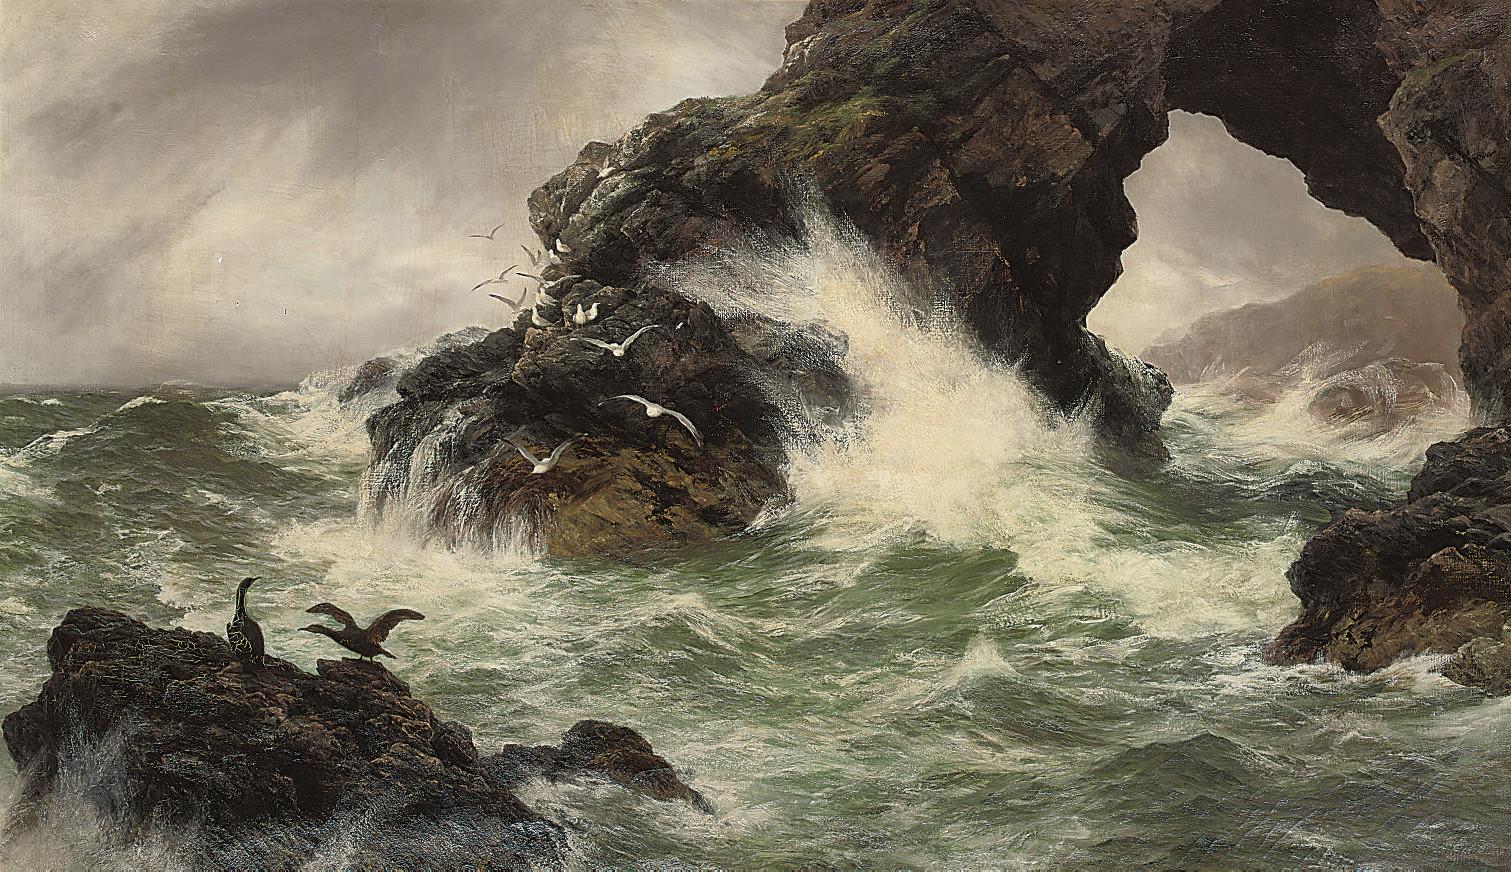 Sea worn rocks